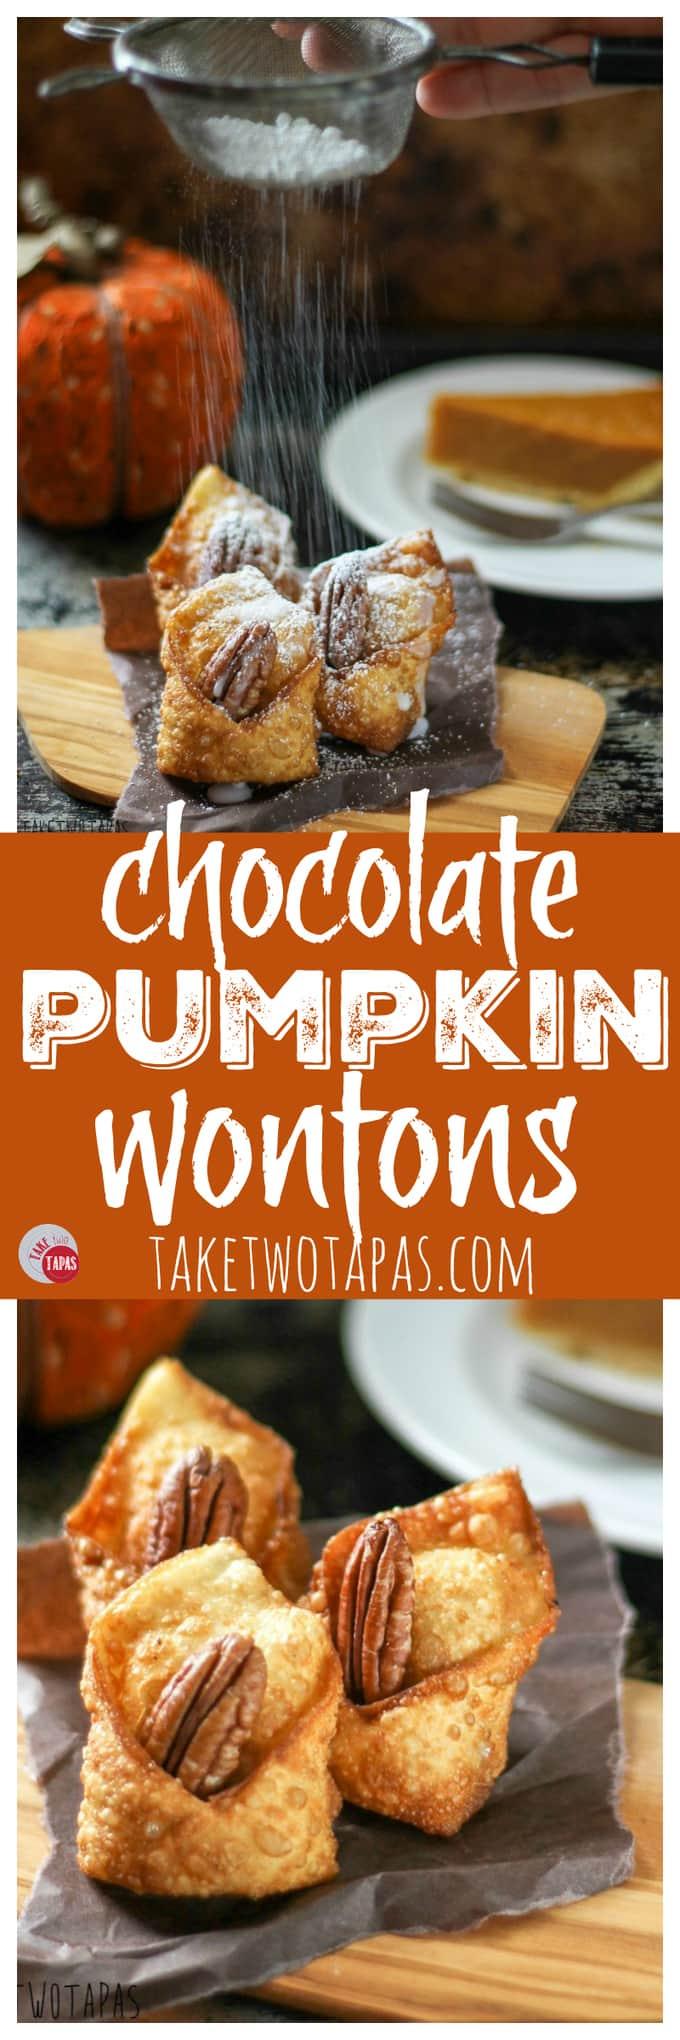 Chocolate Pumpkin Wontons for Halloween | Take Two Tapas